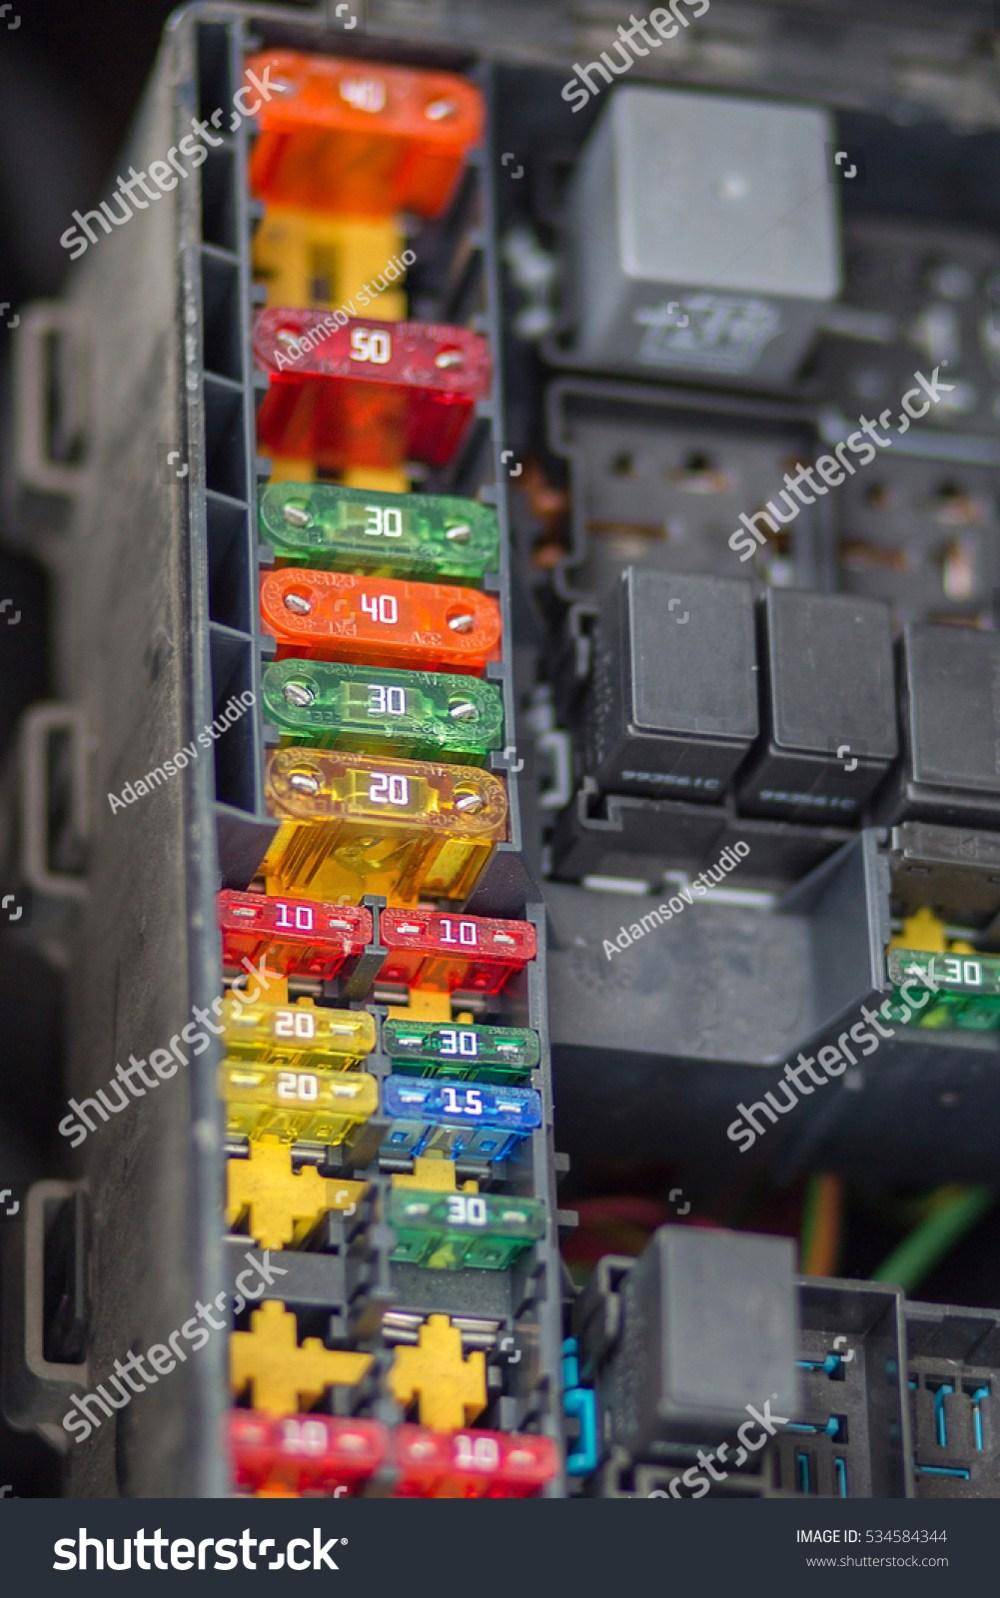 medium resolution of close up view focus of car fuse box control engine lighting of car car